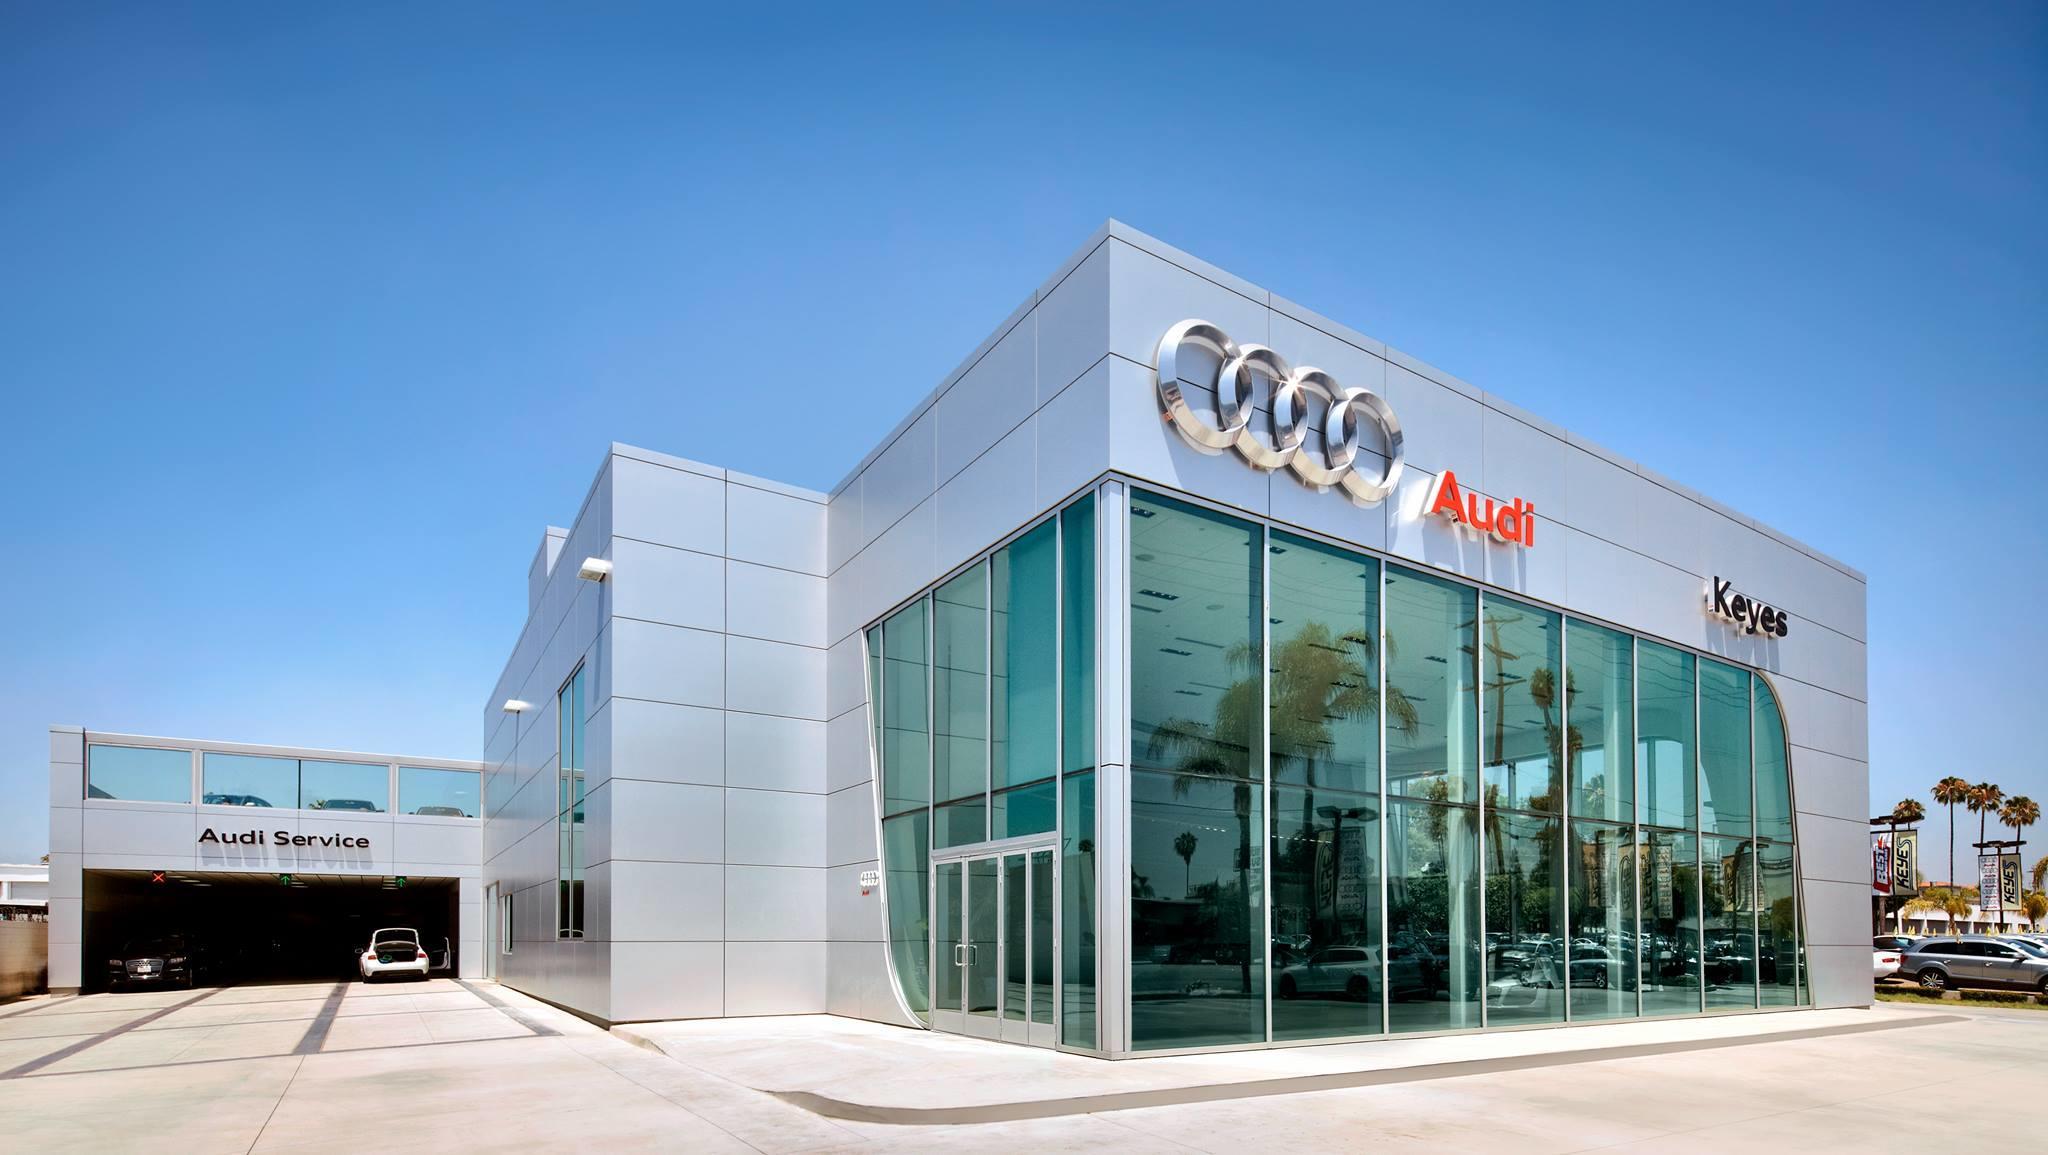 Keyes Audi - Los Angeles, CA 91401 - (818)528-5931 | ShowMeLocal.com